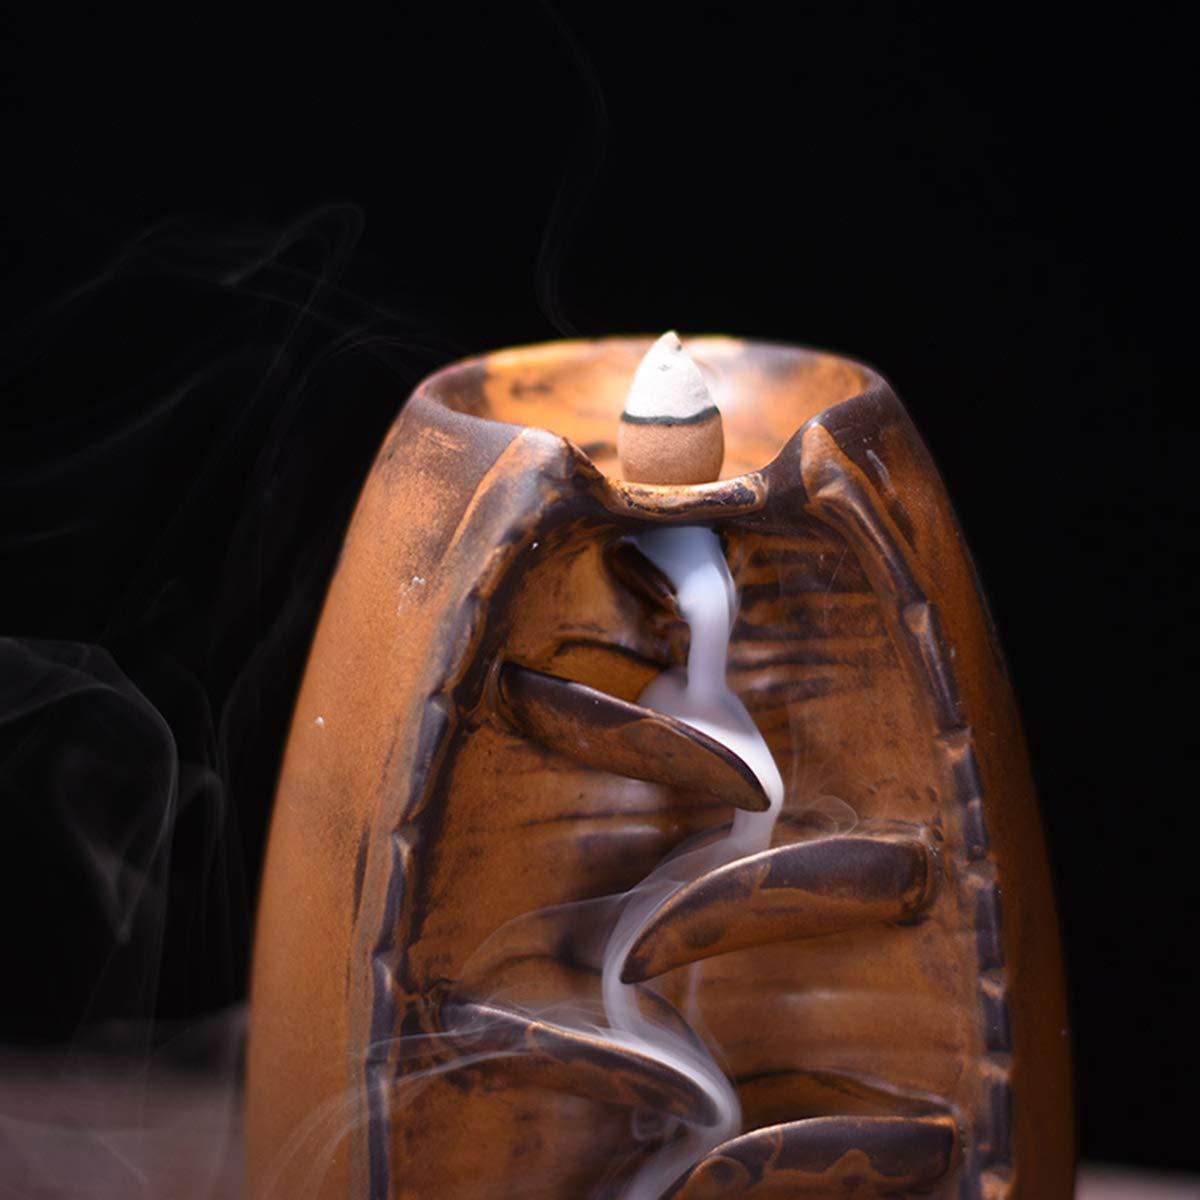 Mayco Bell Backflow Incense Burner Home Decor Ceramica Fumo Cascata Porta incenso Buddista Aroma Censer 10PCS incenso